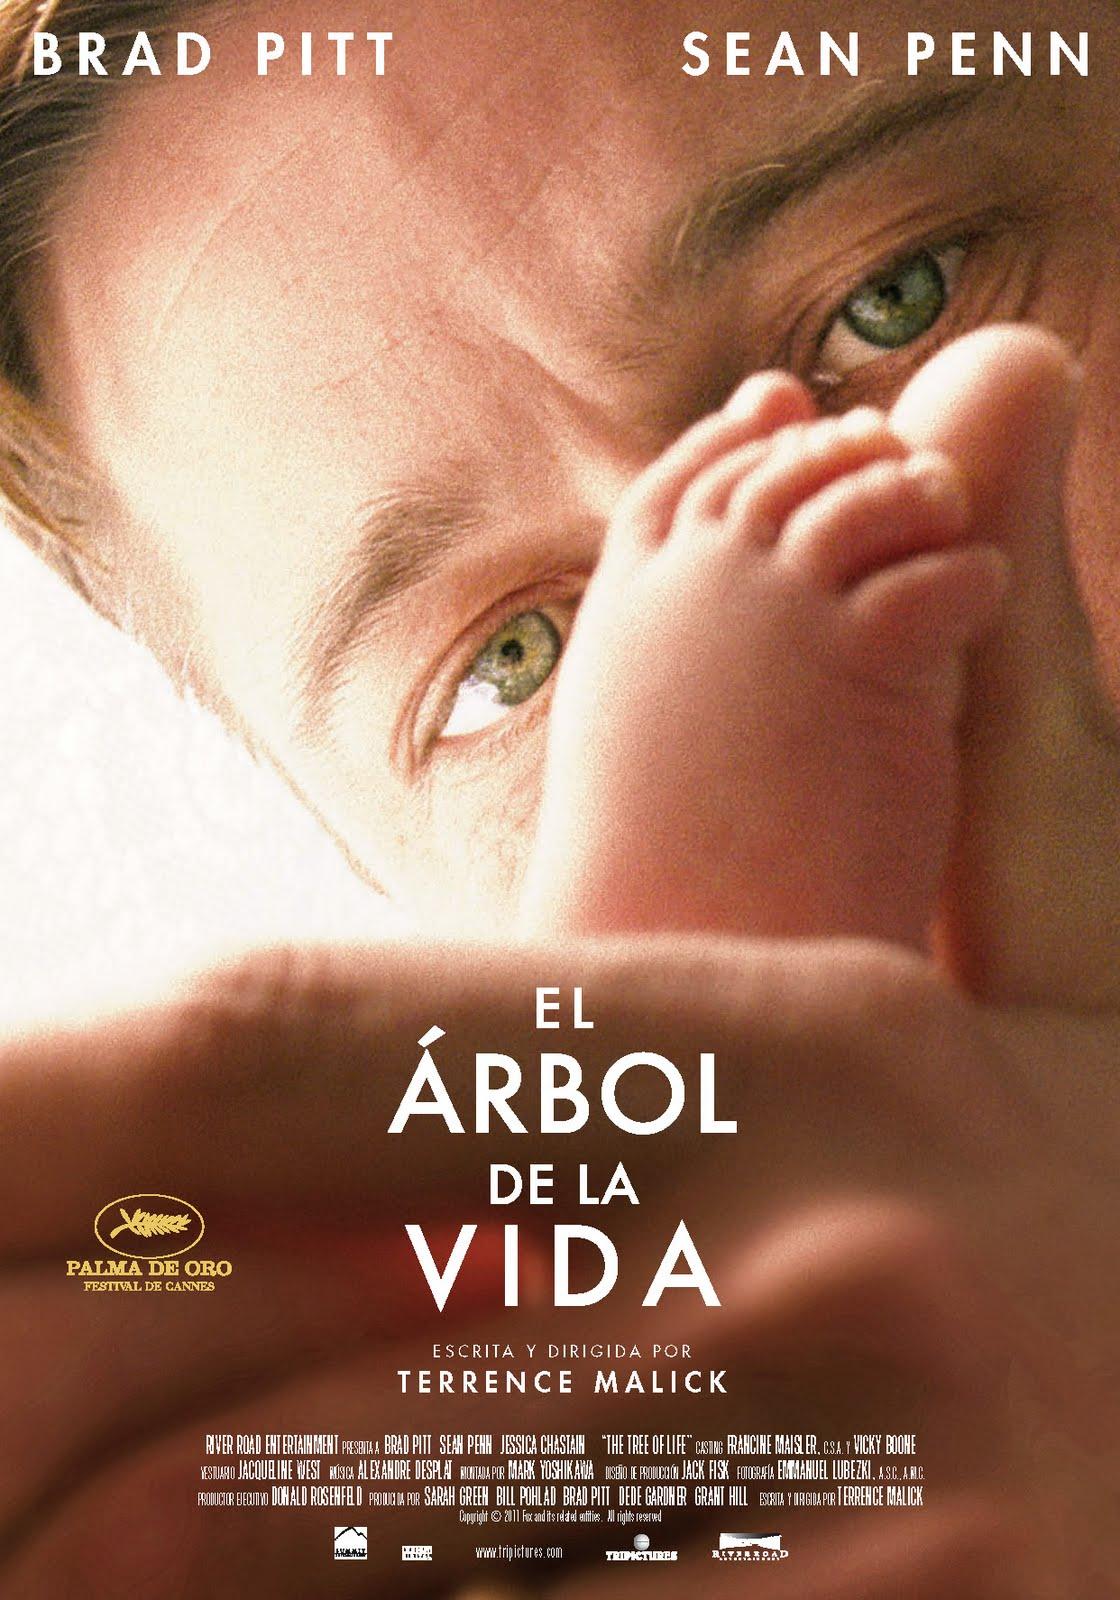 http://3.bp.blogspot.com/-cdX98TI3W14/TwydifTOKBI/AAAAAAAAI0g/Sgyj-6Ua_UA/s1600/Cartel_El_Arbol_de_la_Vida_cine_bataclan.jpg